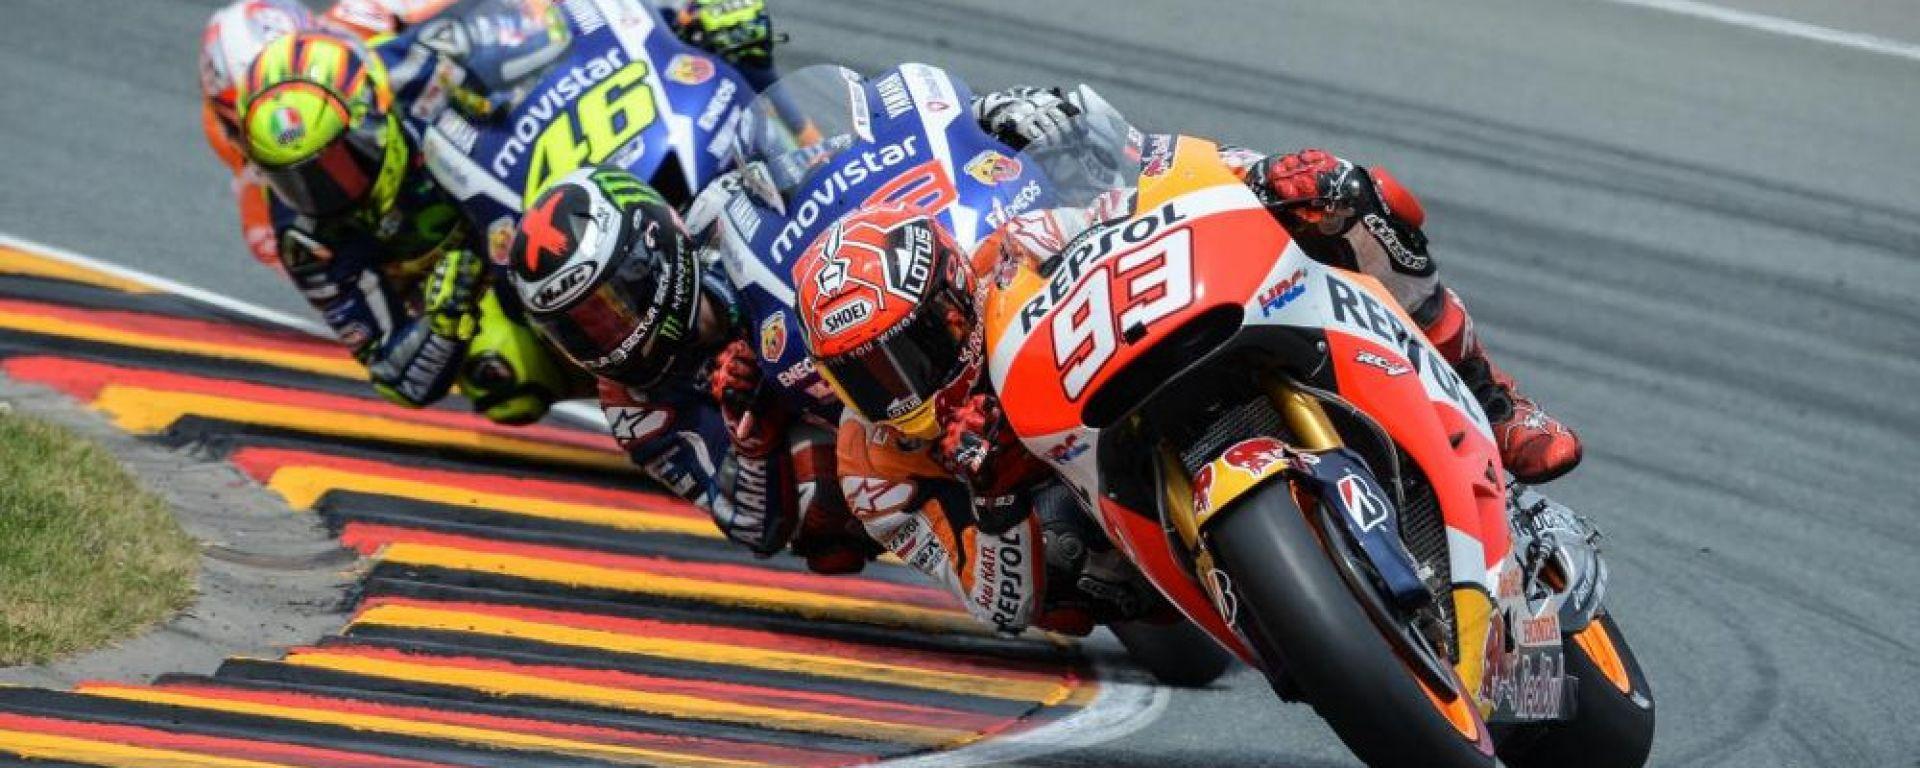 MotoGP Germania 2015: Marc Marquez, Jorge Lorenzo, Valentino Rossi (Yamaha) e Daniel Pedrosa (Honda)